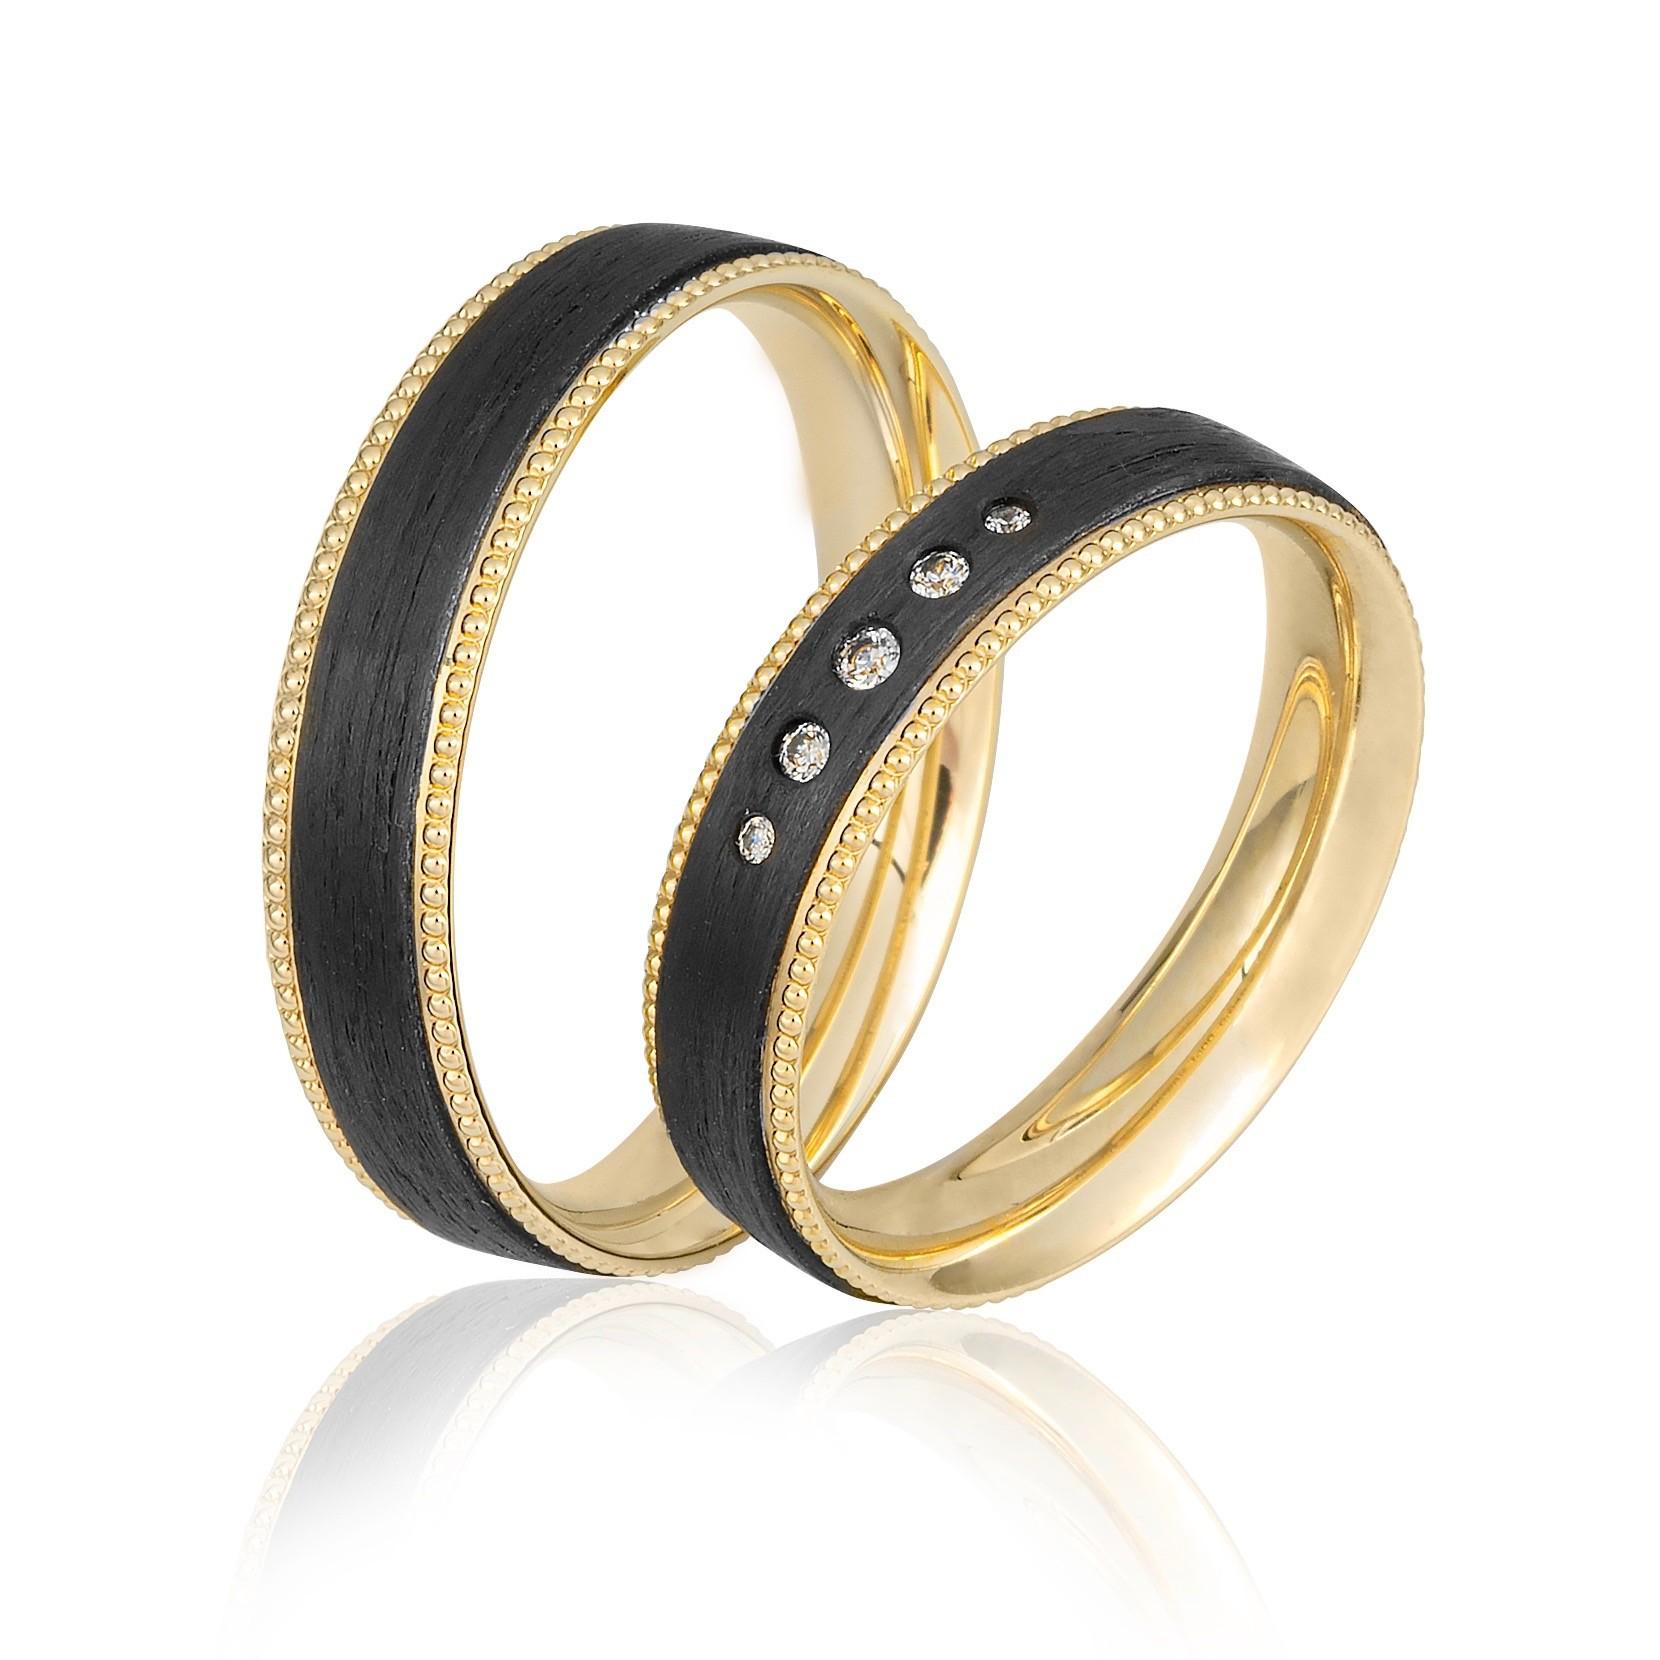 Carbon-Ringe von Breuning